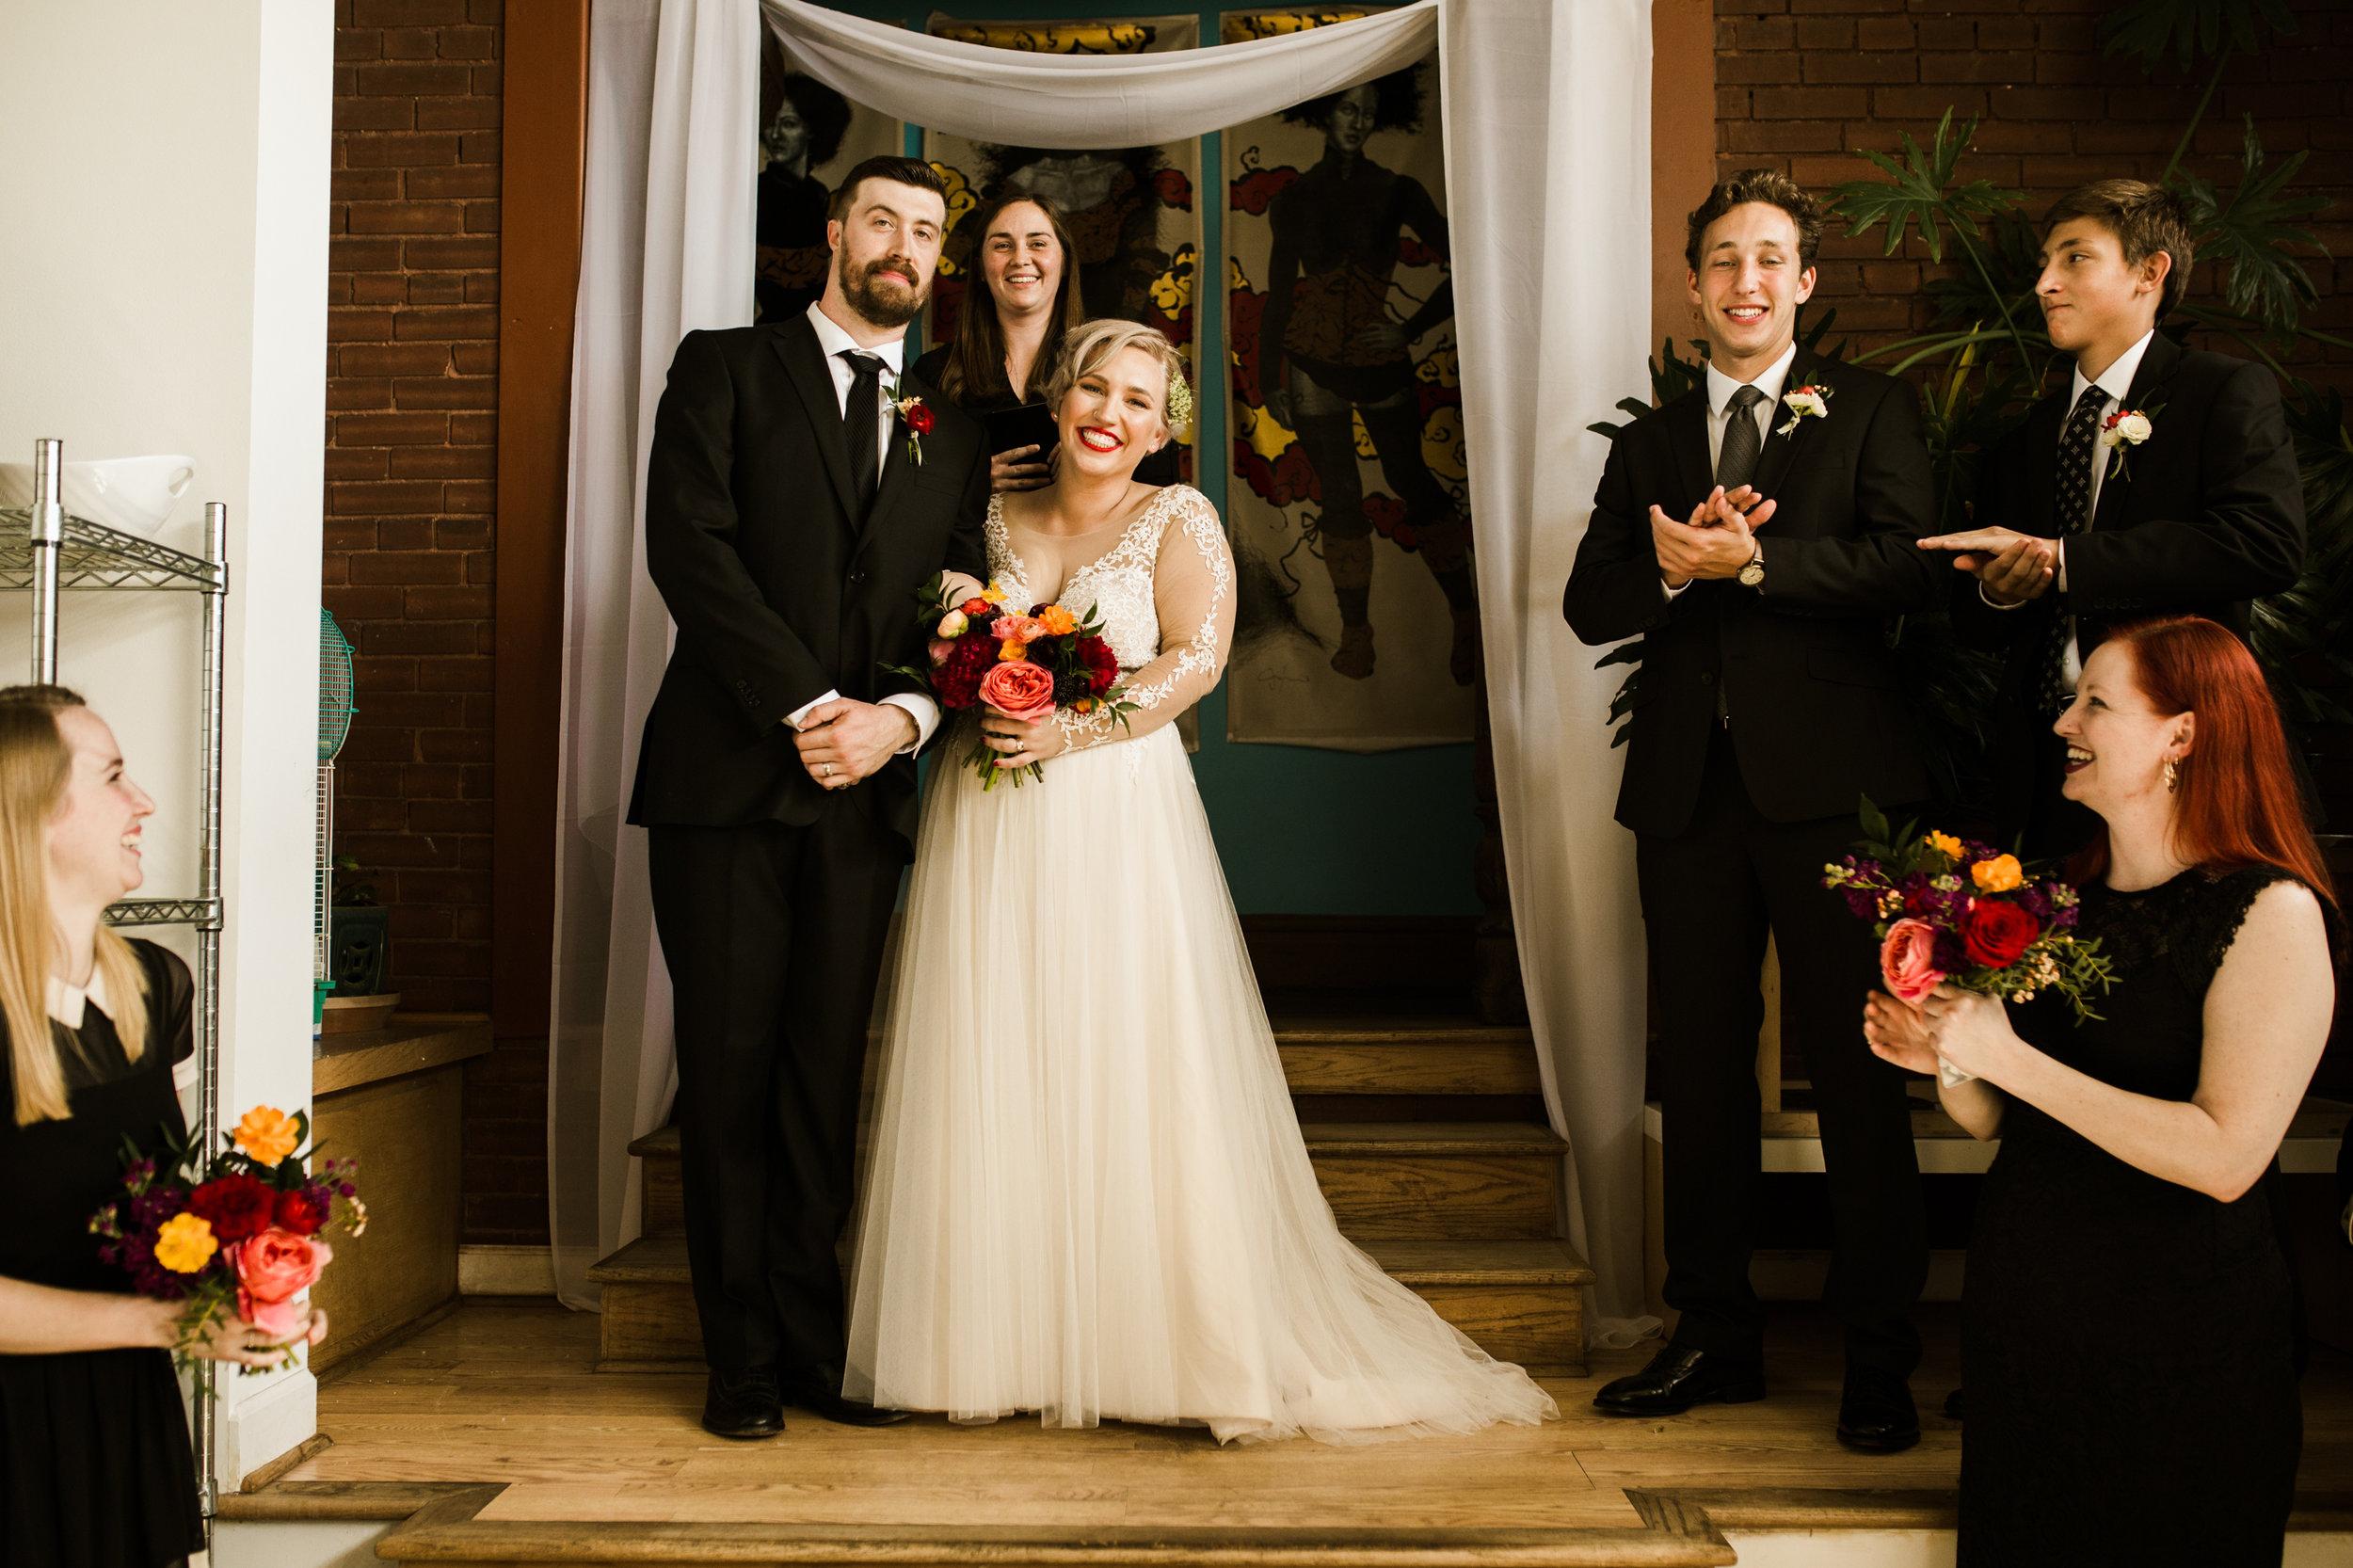 Kentucky Wedding Louisville Wedding Photographer 2018 Crystal Ludwick Photo Louisville Wedding Photographer Kentucky Wedding Photographer (59 of 105).jpg